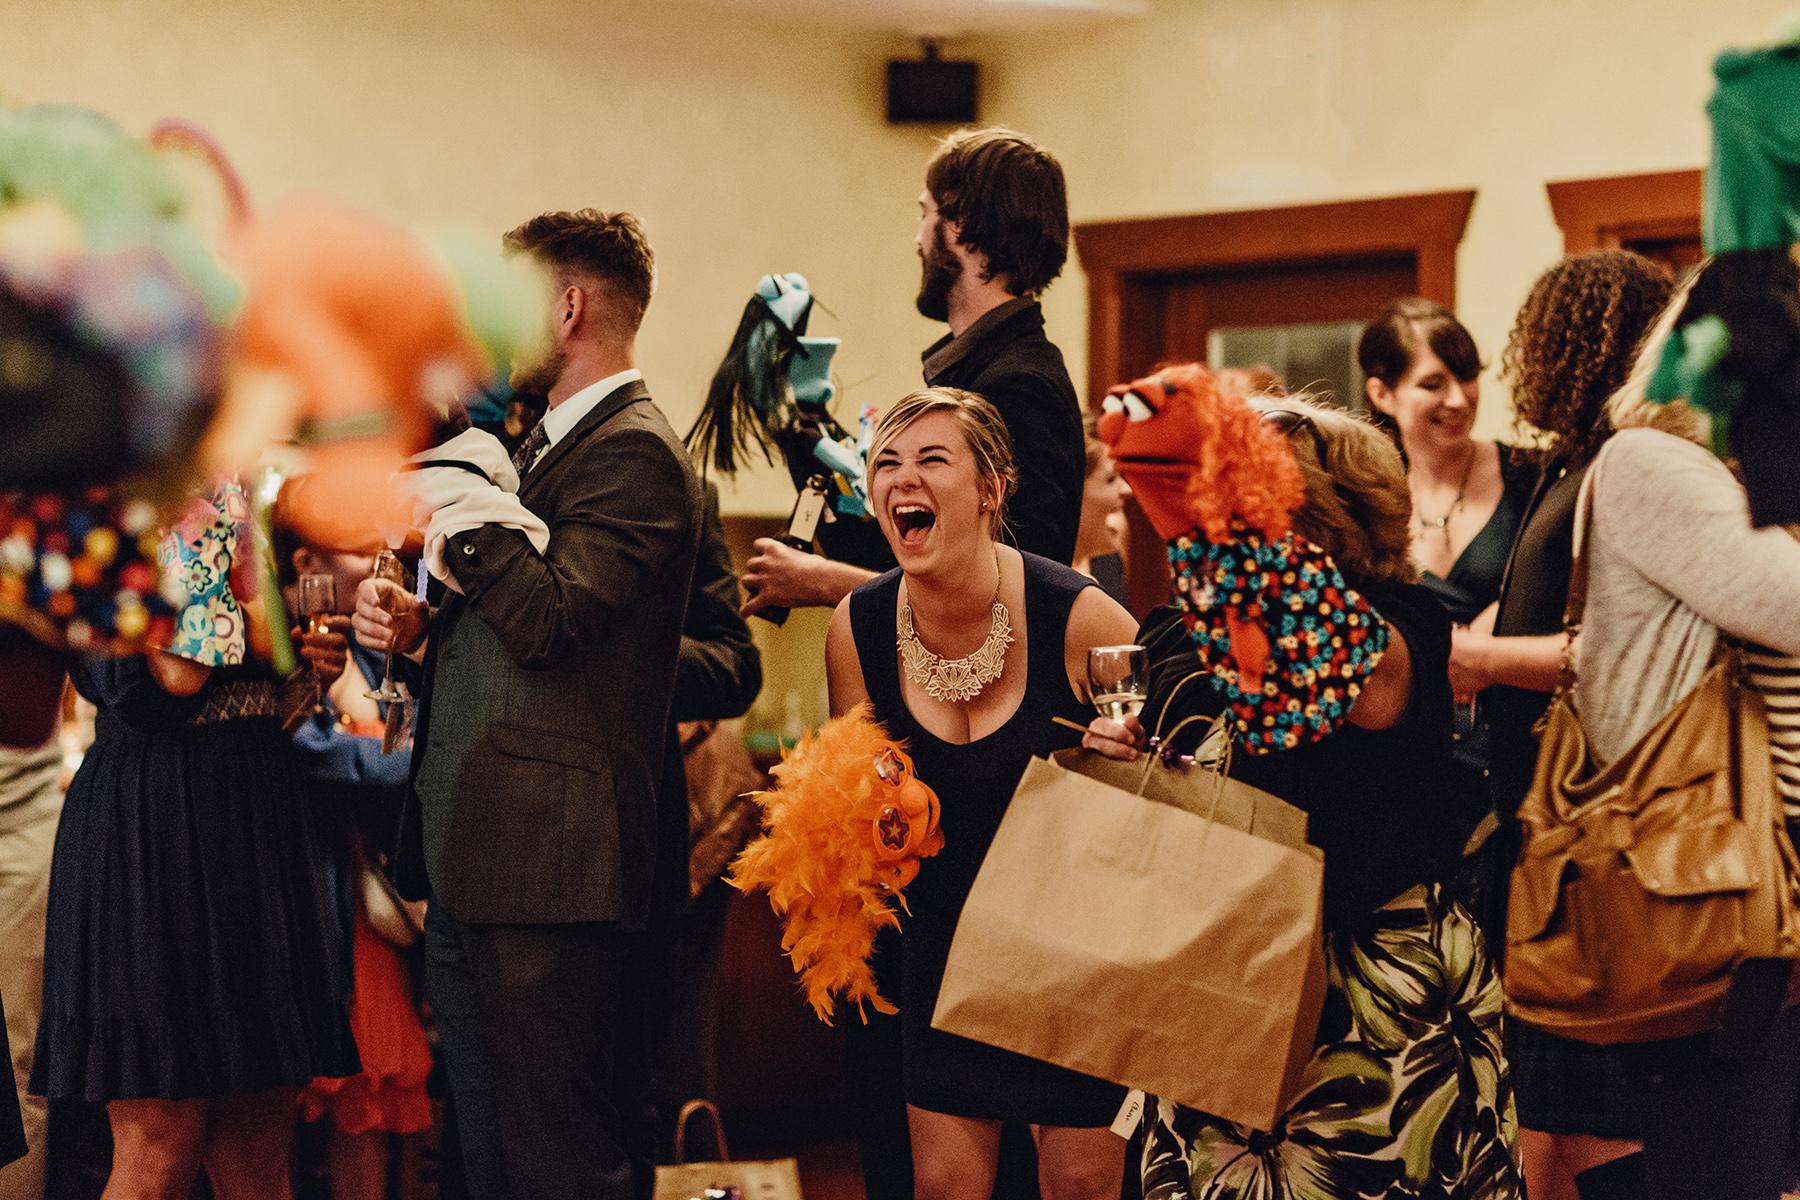 chelsea-brian-wedding-photos-0028.jpg